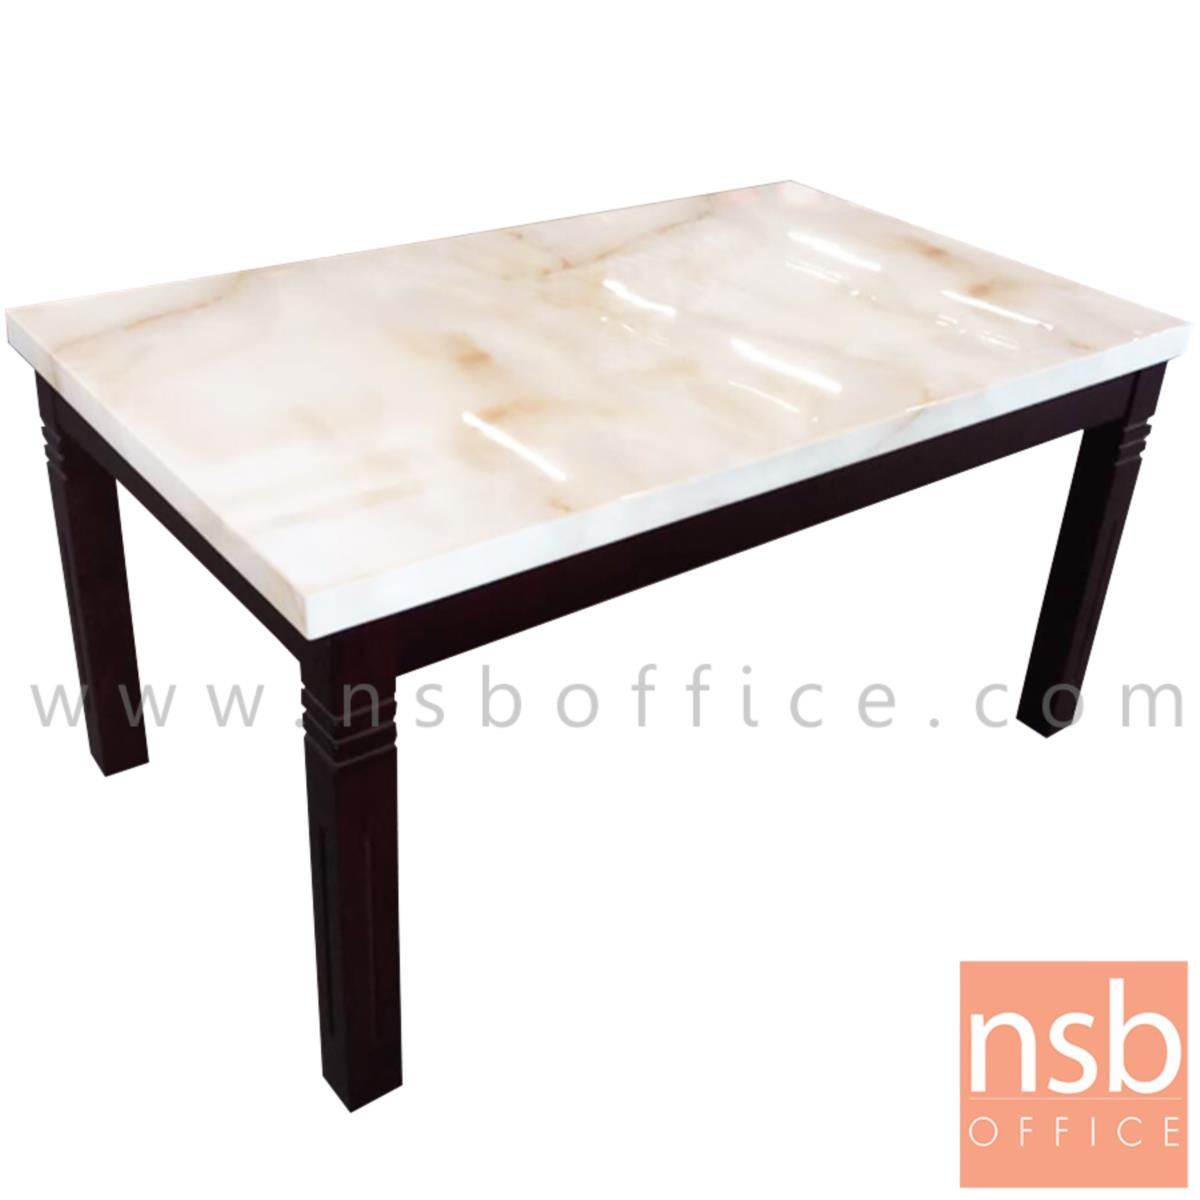 G14A162:โต๊ะรับประทานอาหารหน้าหินอ่อน รุ่น Nicholson (นิโคลสัน) ขนาด 180W cm.  ขาเหลี่ยม